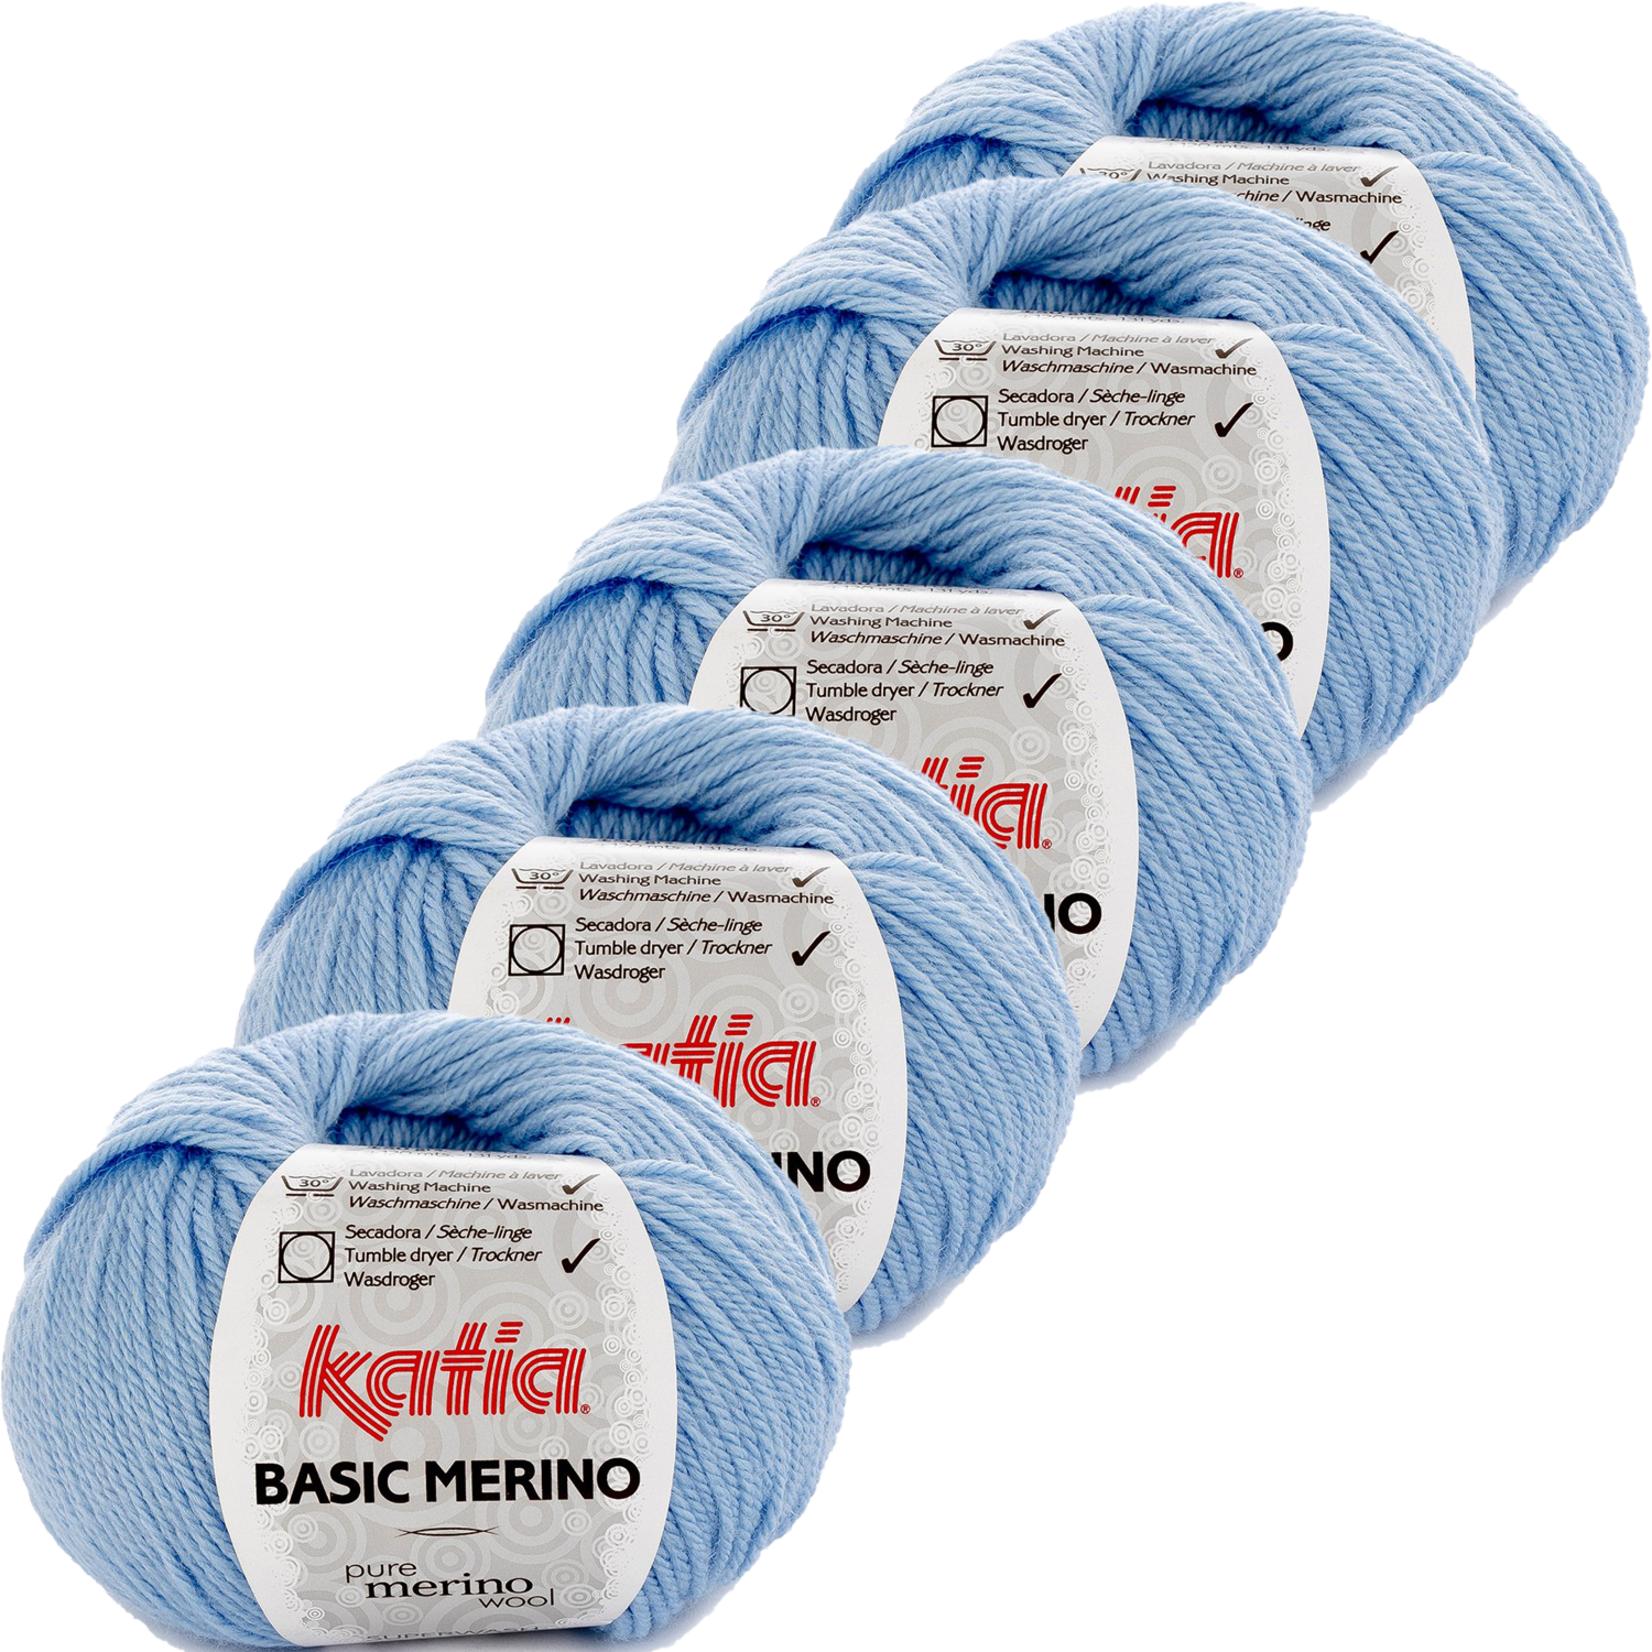 Katia Basic Merino - kleur 34_Hemelsblauw - bundel 5 bollen 50 gr.  van 120 m.